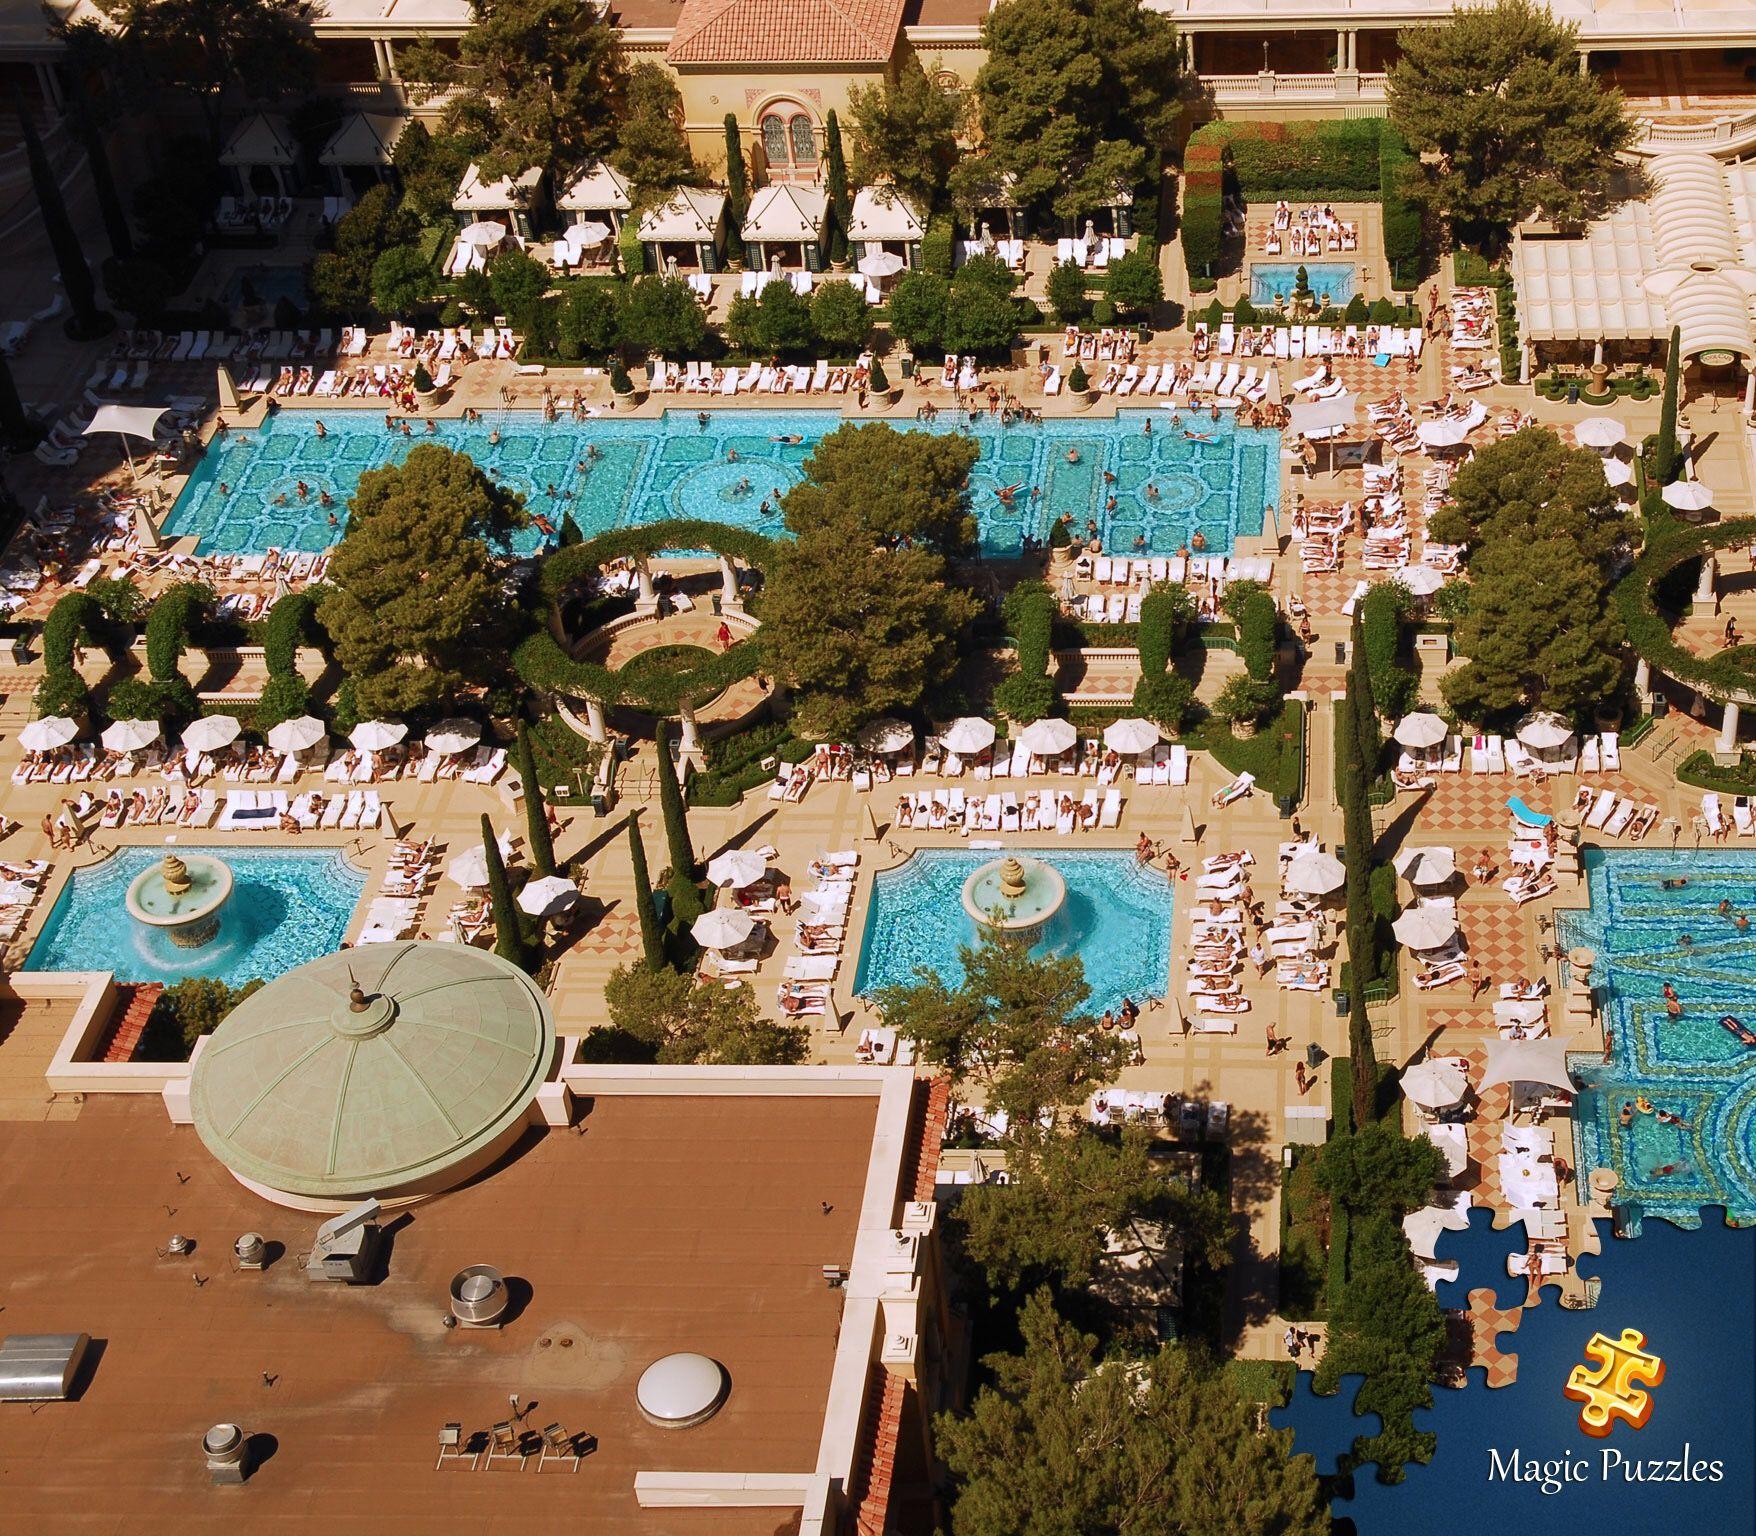 Swimming Pools At The Bellagio Hotel Vegas Pools Best Pools In Vegas Las Vegas Trip